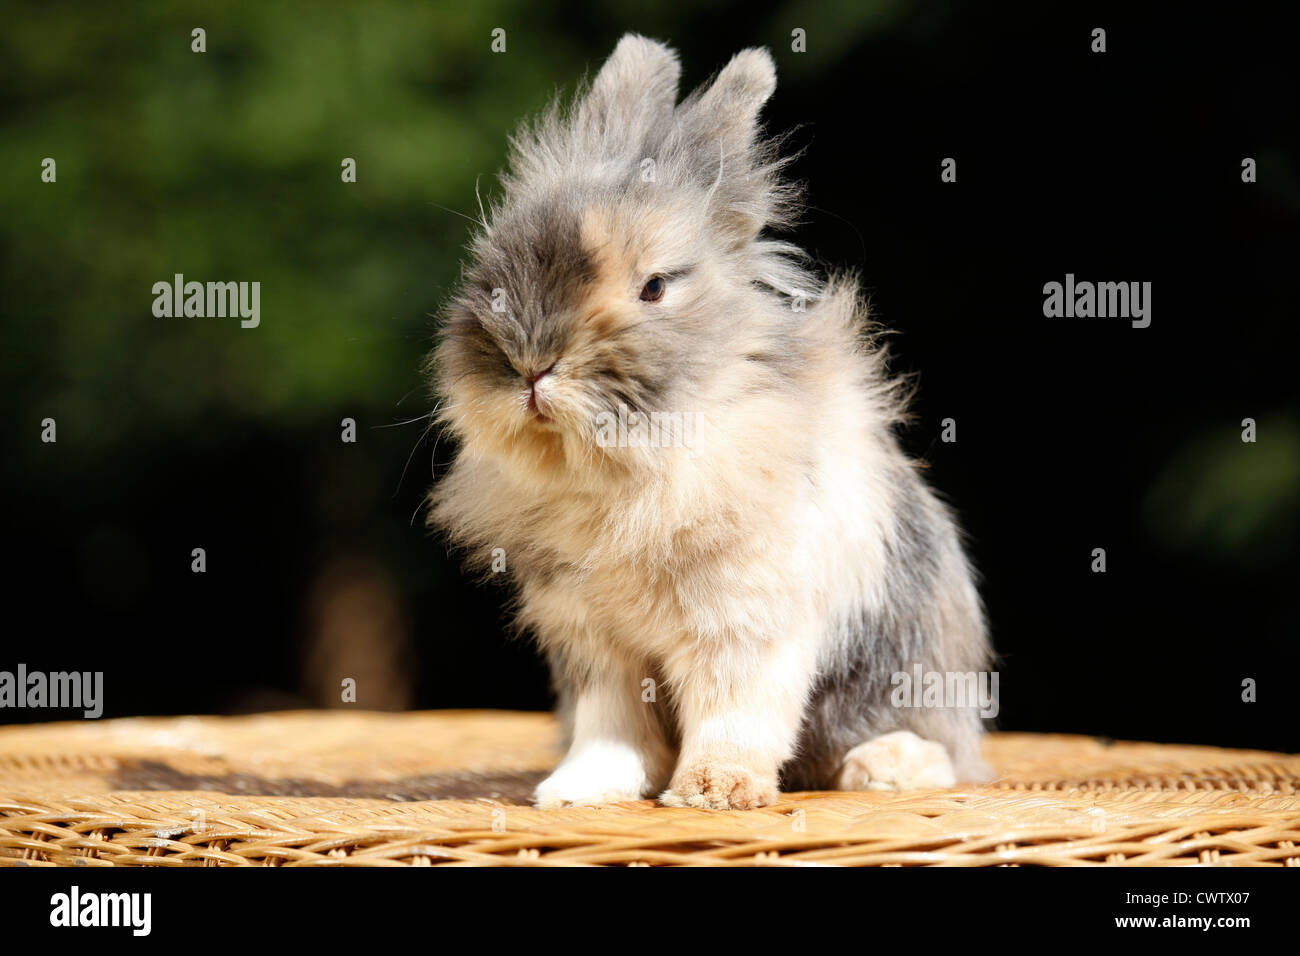 Zwergkaninchen / pygmy bunny - Stock Image